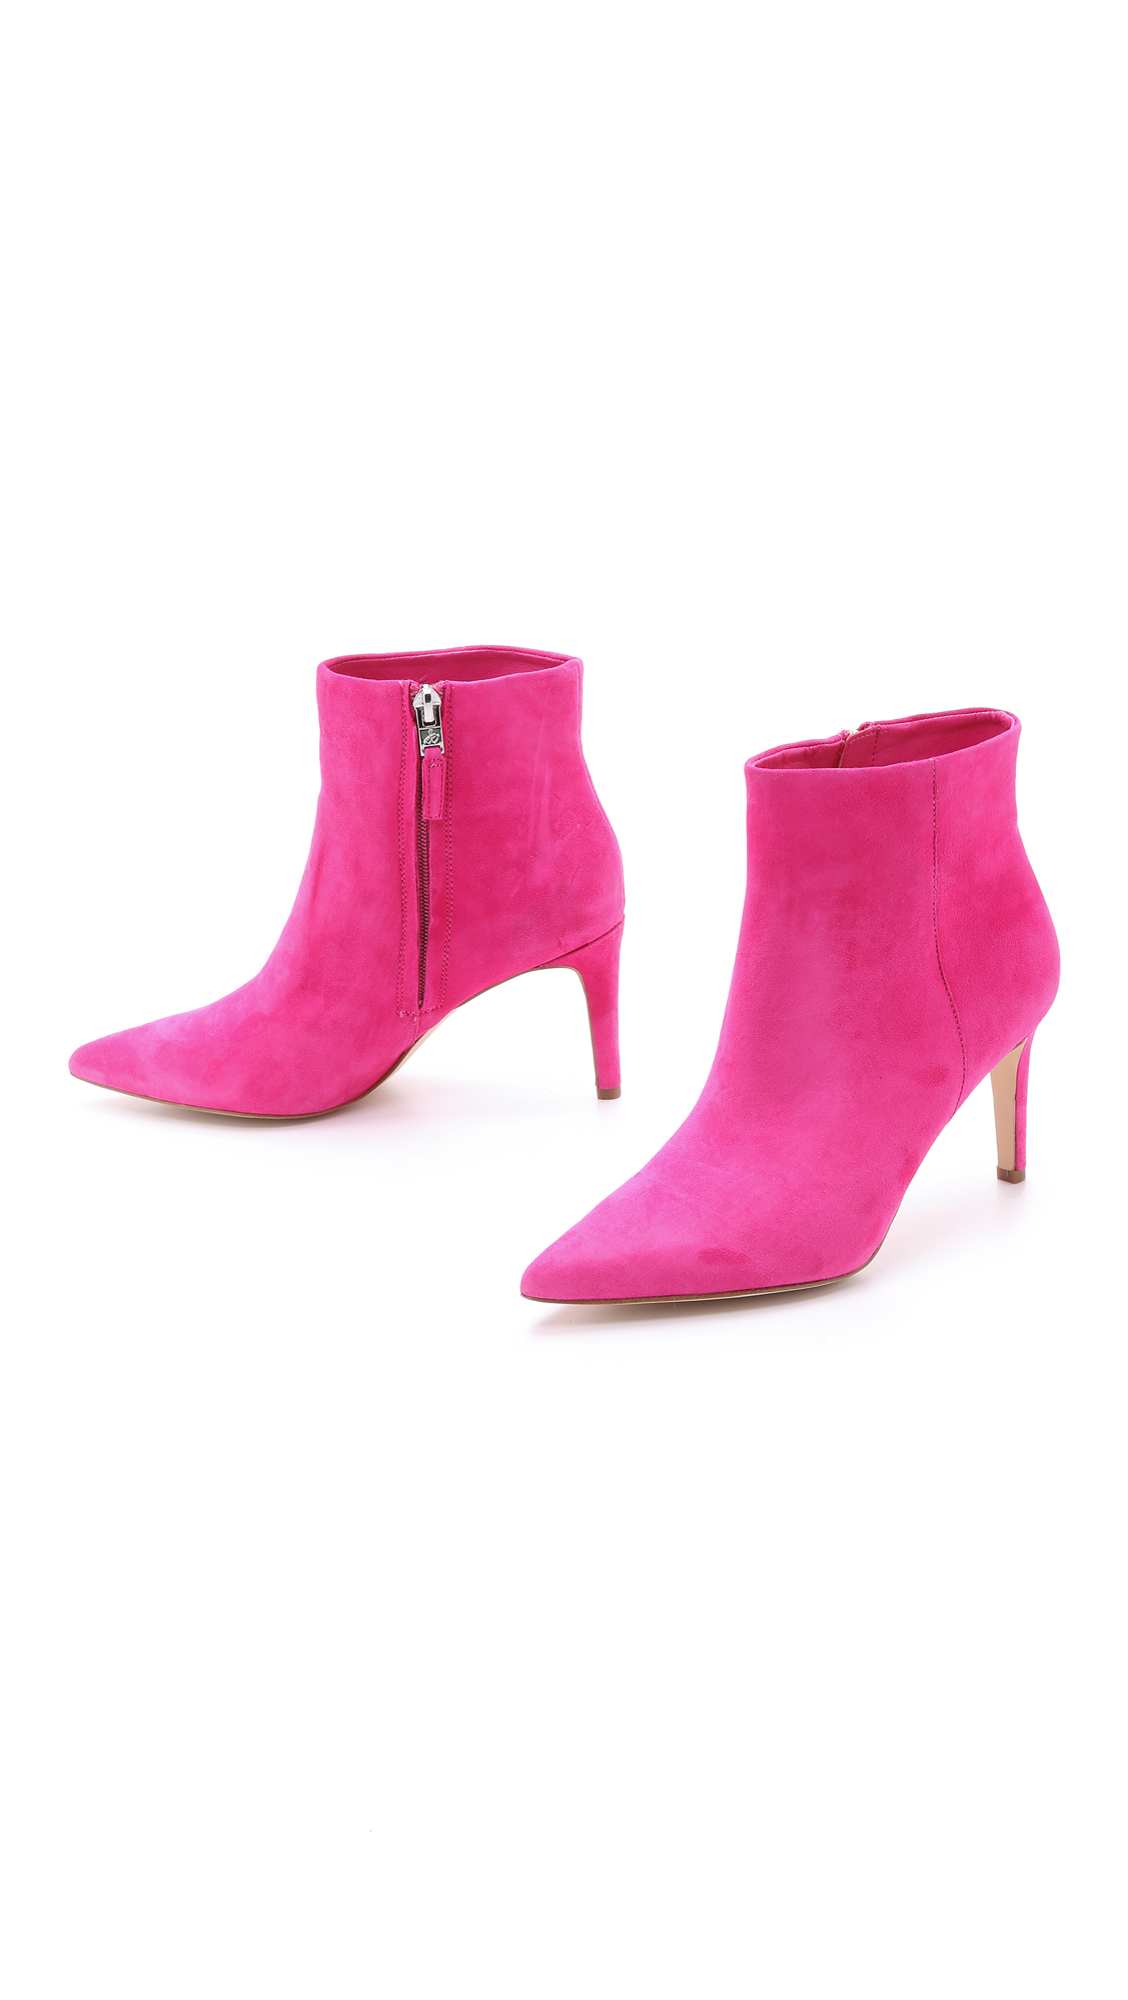 c9d75d8349f6 Lyst - Sam Edelman Karen Suede Booties - Candy Pink in Pink